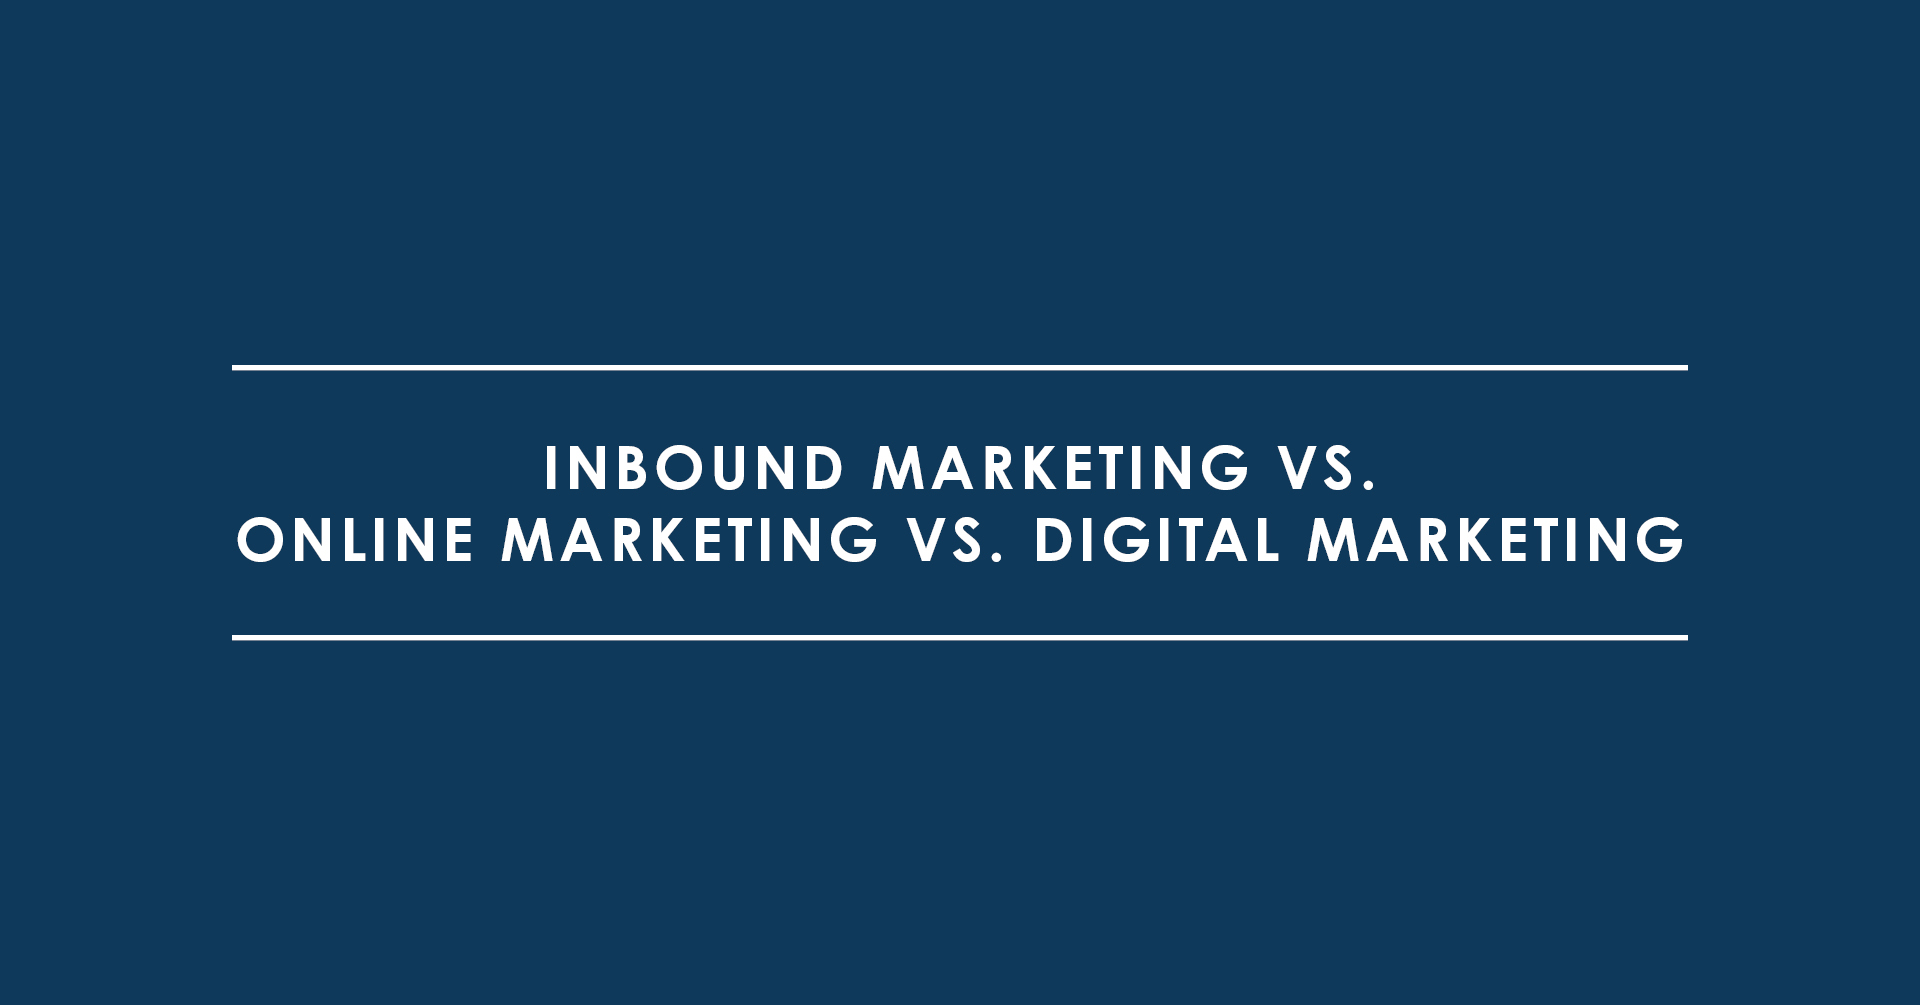 Inbound Marketing vs. Online Marketing vs. Digital Marketing